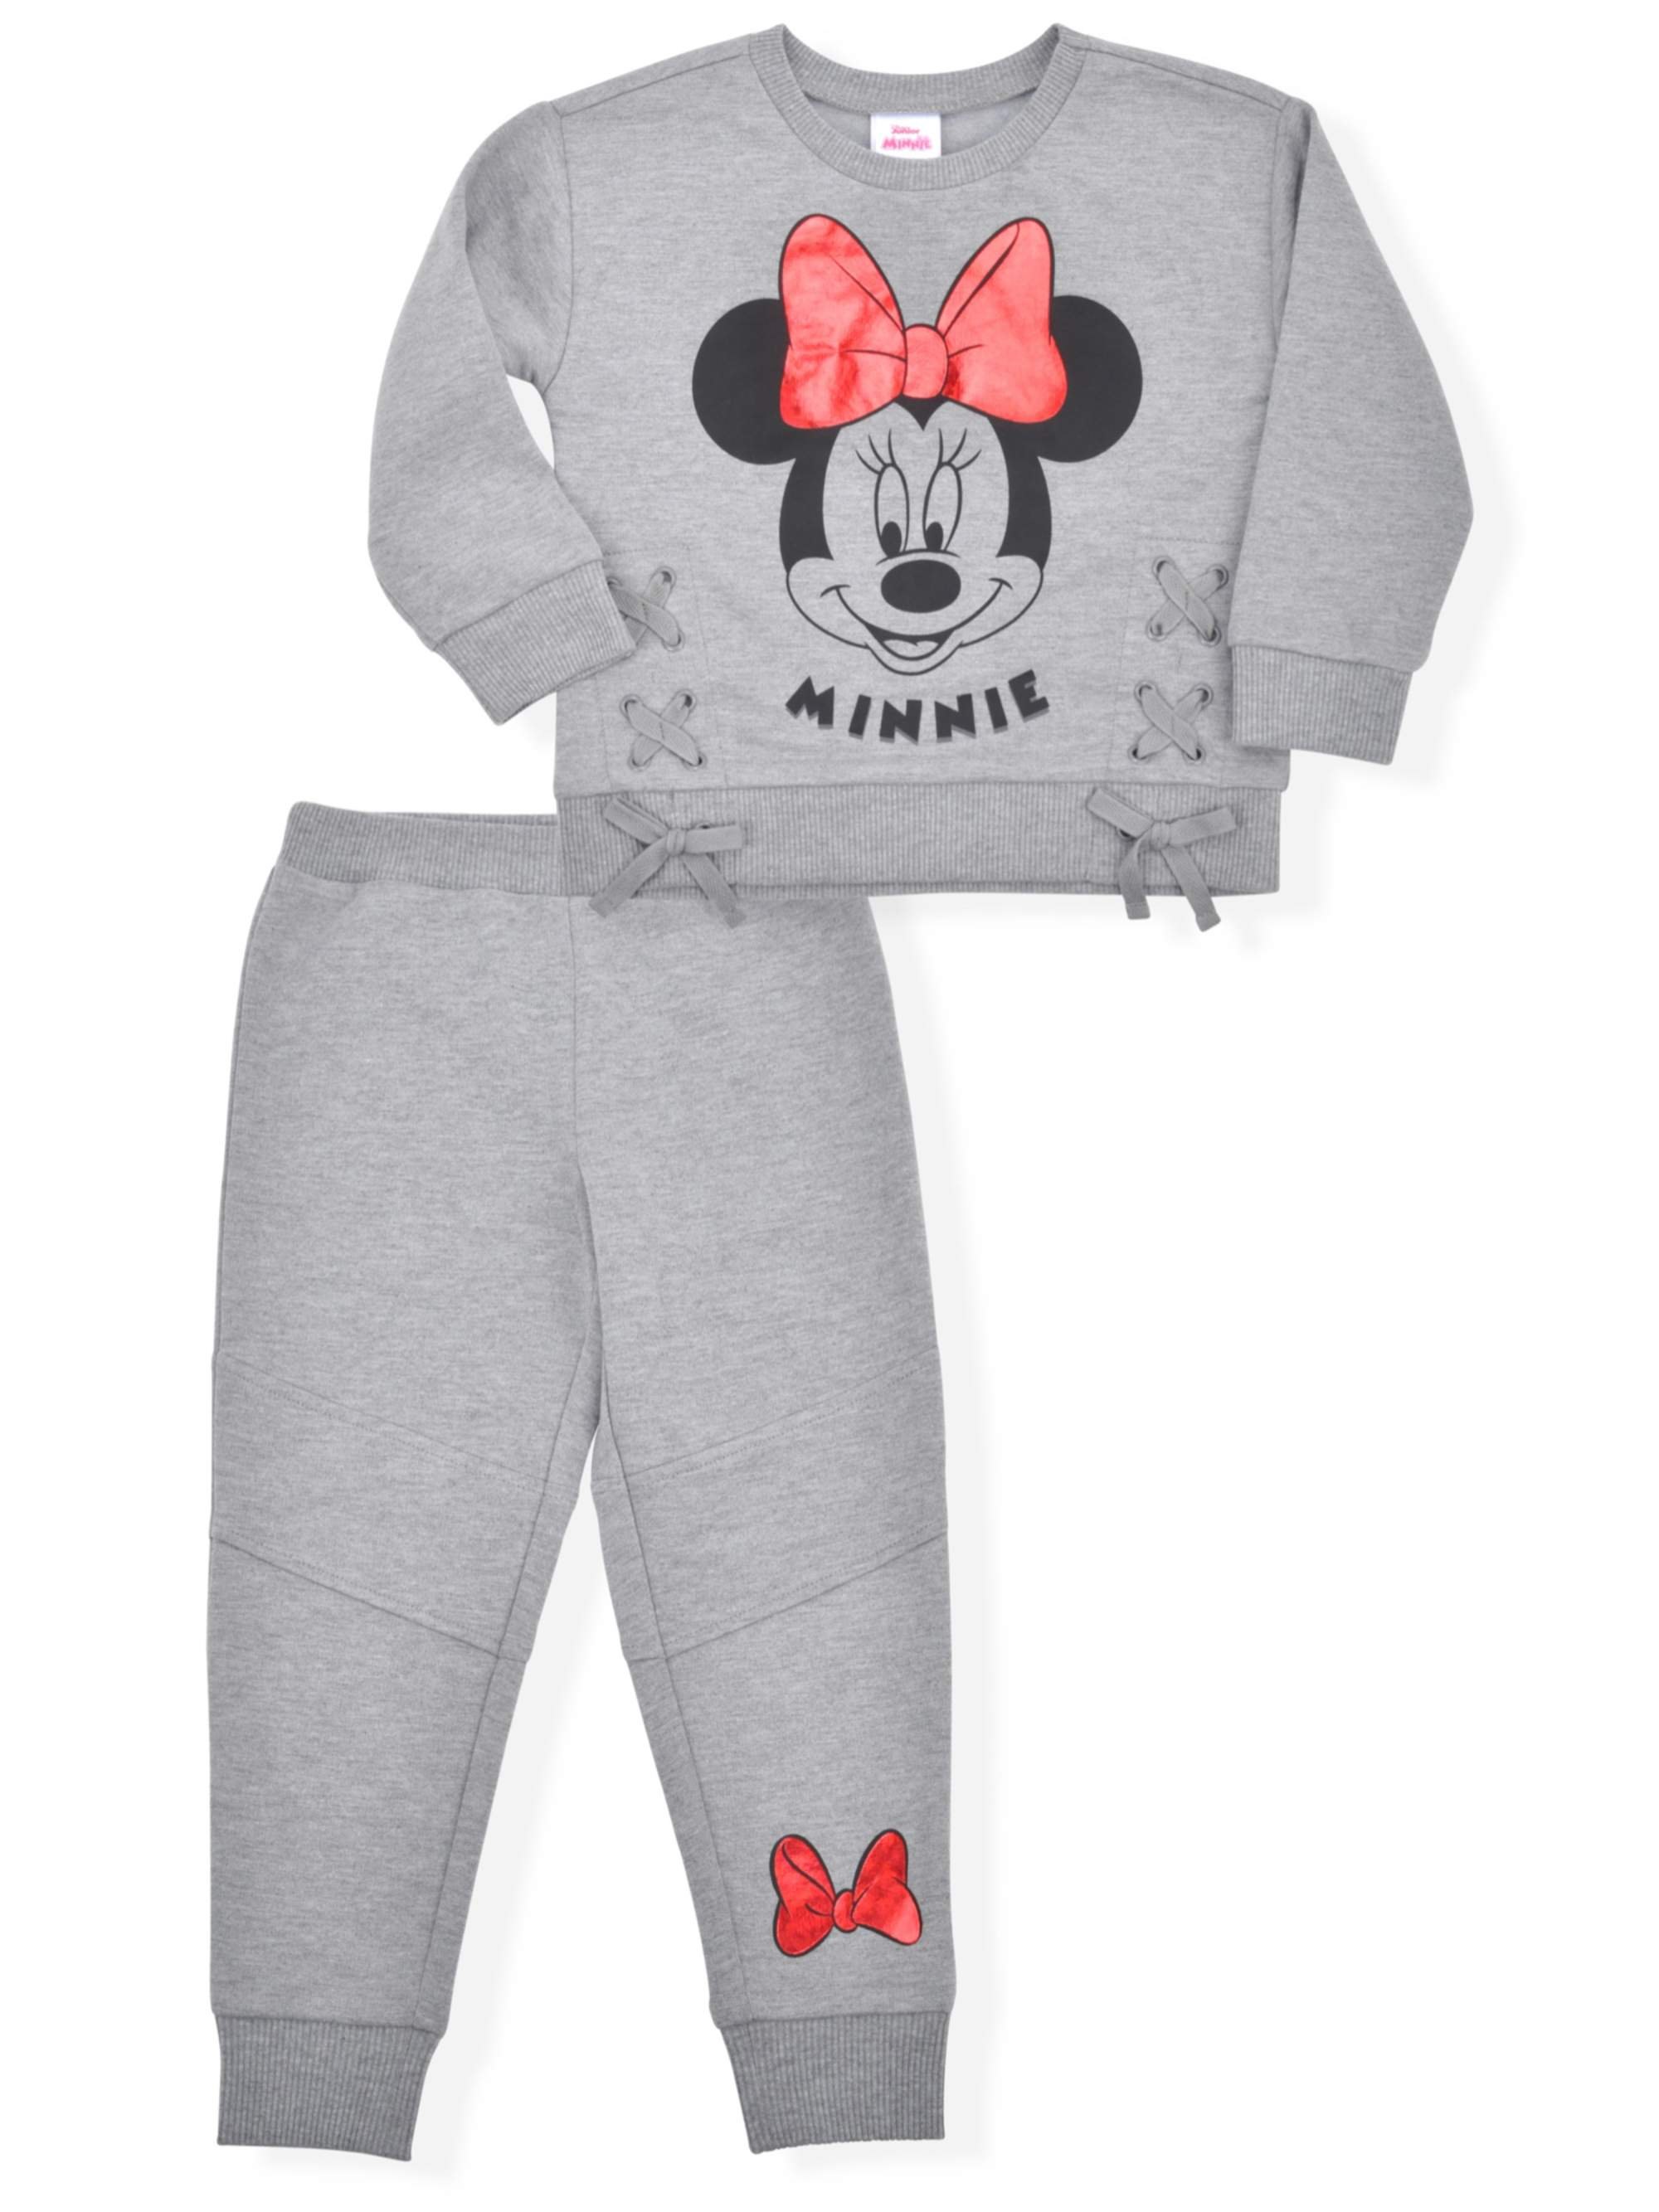 Disney Minnie Mouse Baby Toddler Girls Pink Fleece Sweatshirt 12M 4T 2T 5T